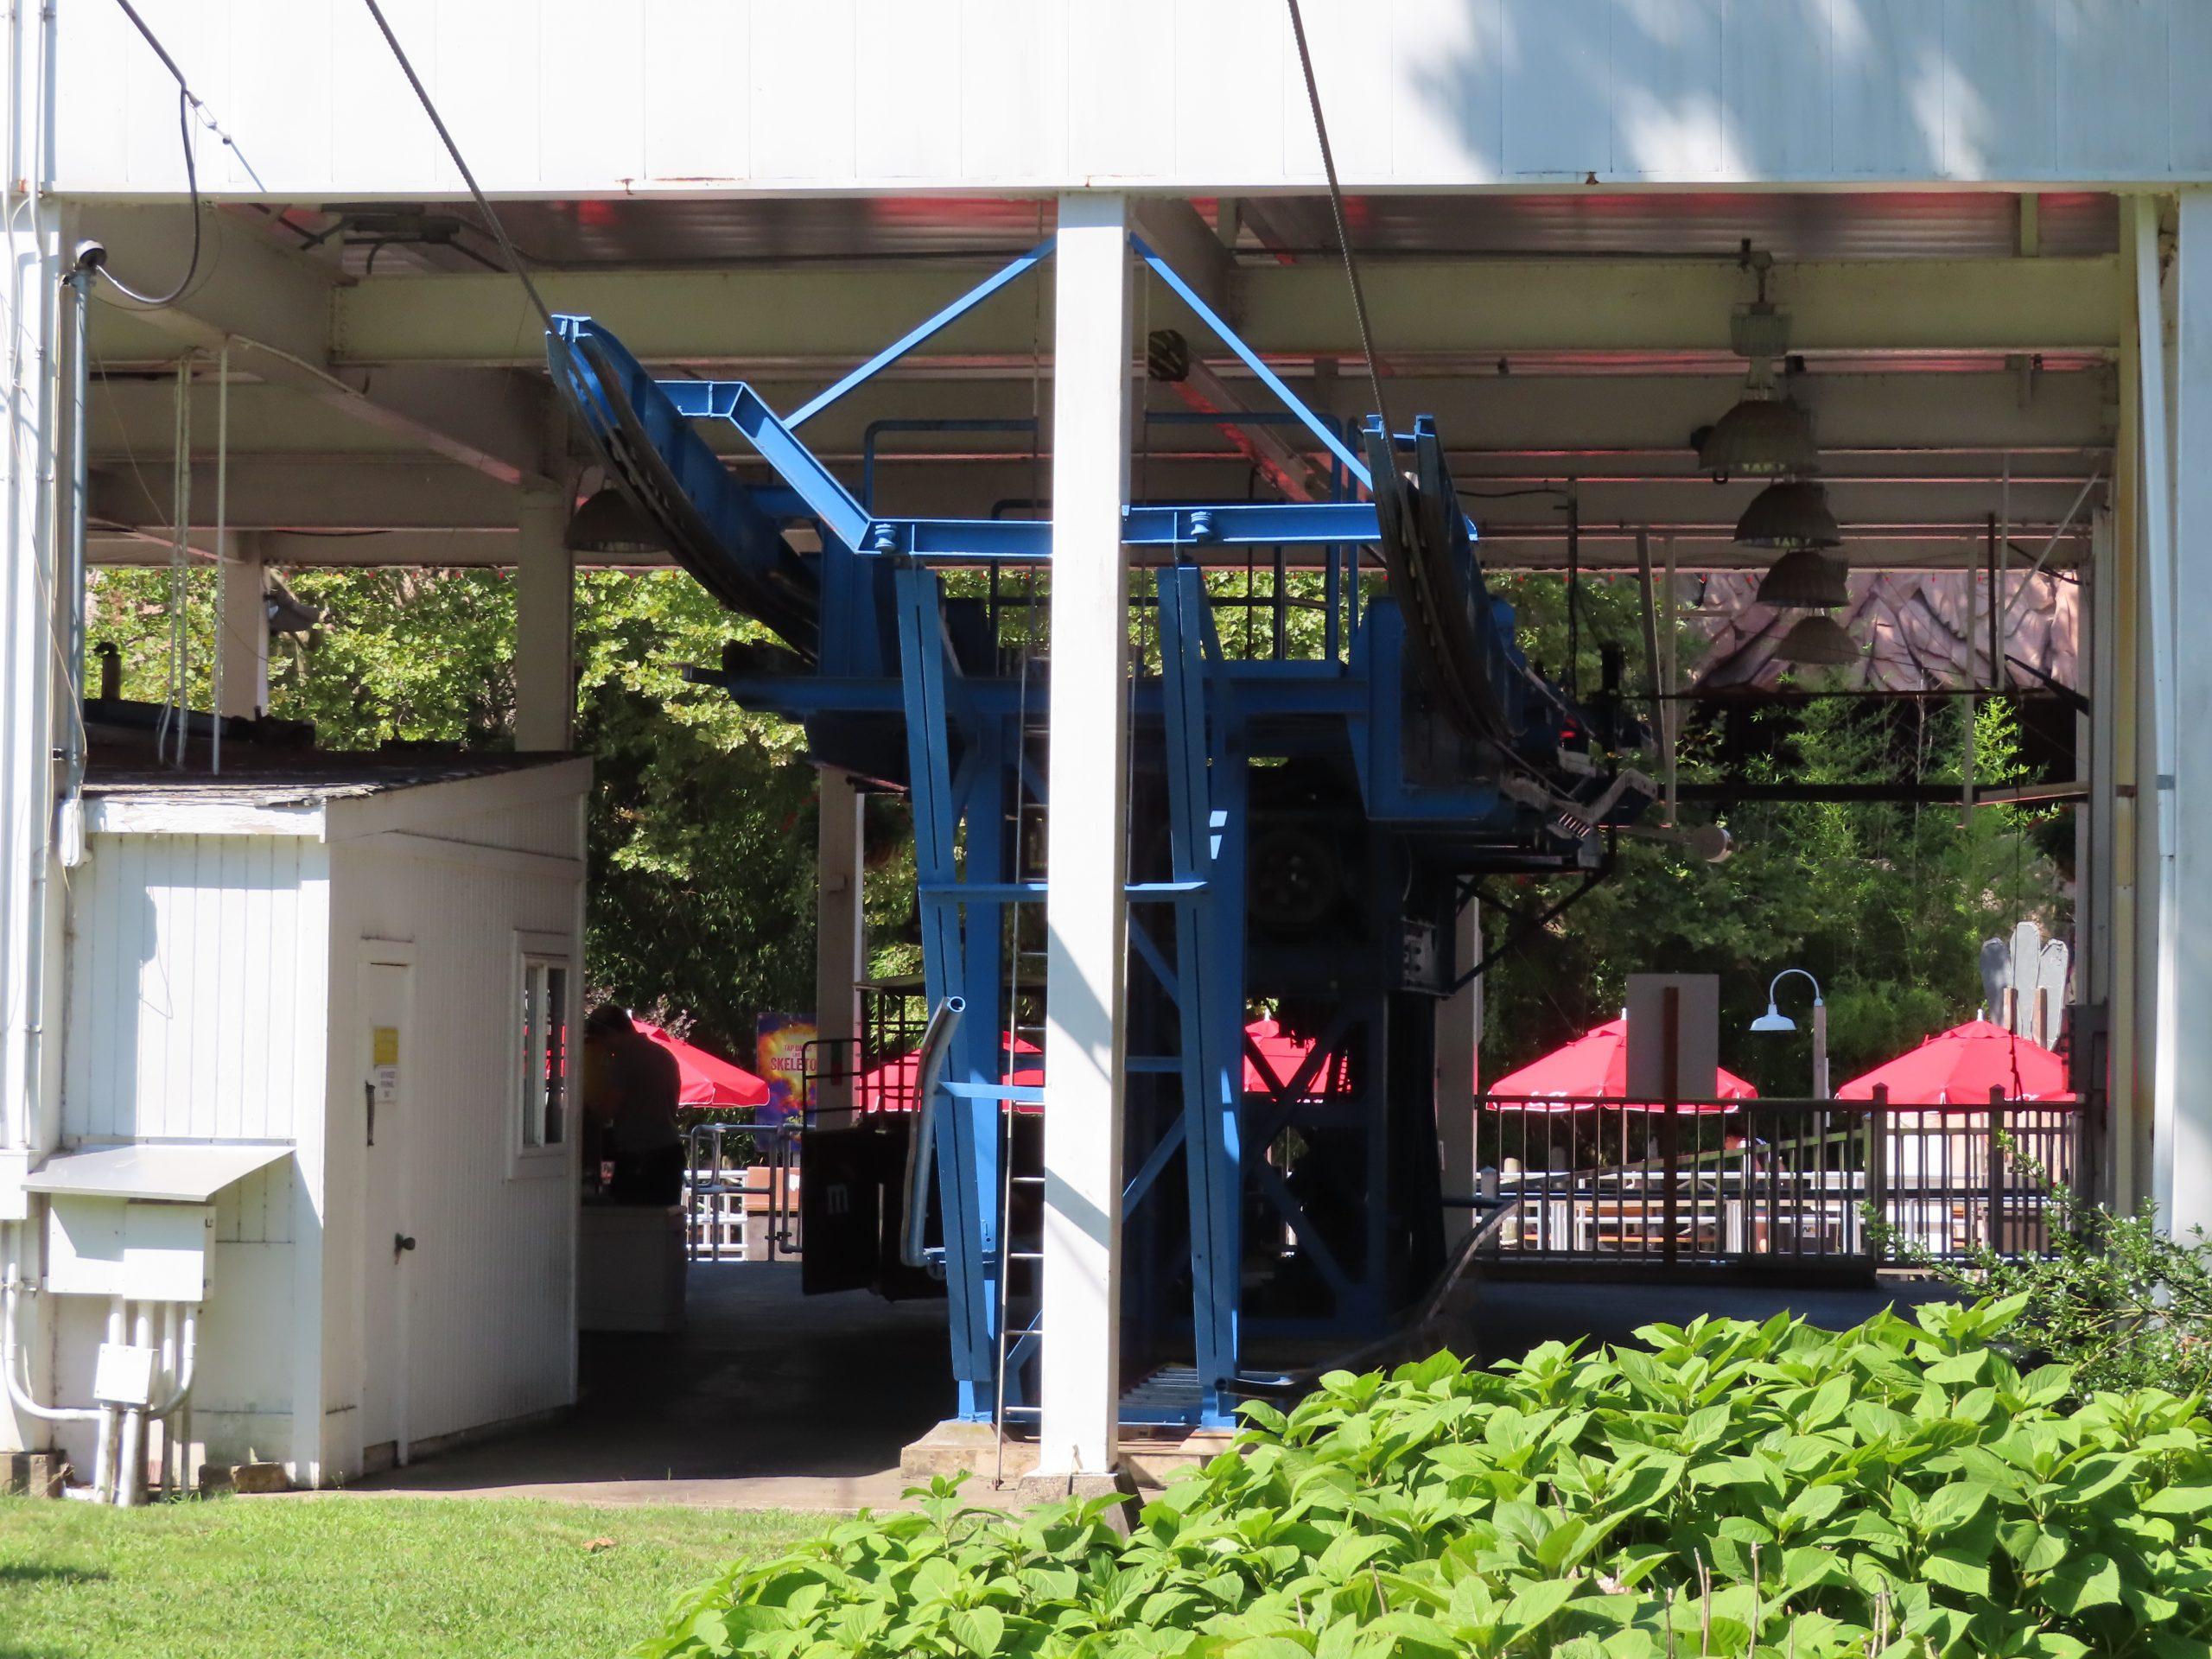 Skyway A – Six Flags Great Adventure, Nj – Lift Blog Within 2021 Calendar Six Flags Great Adventure